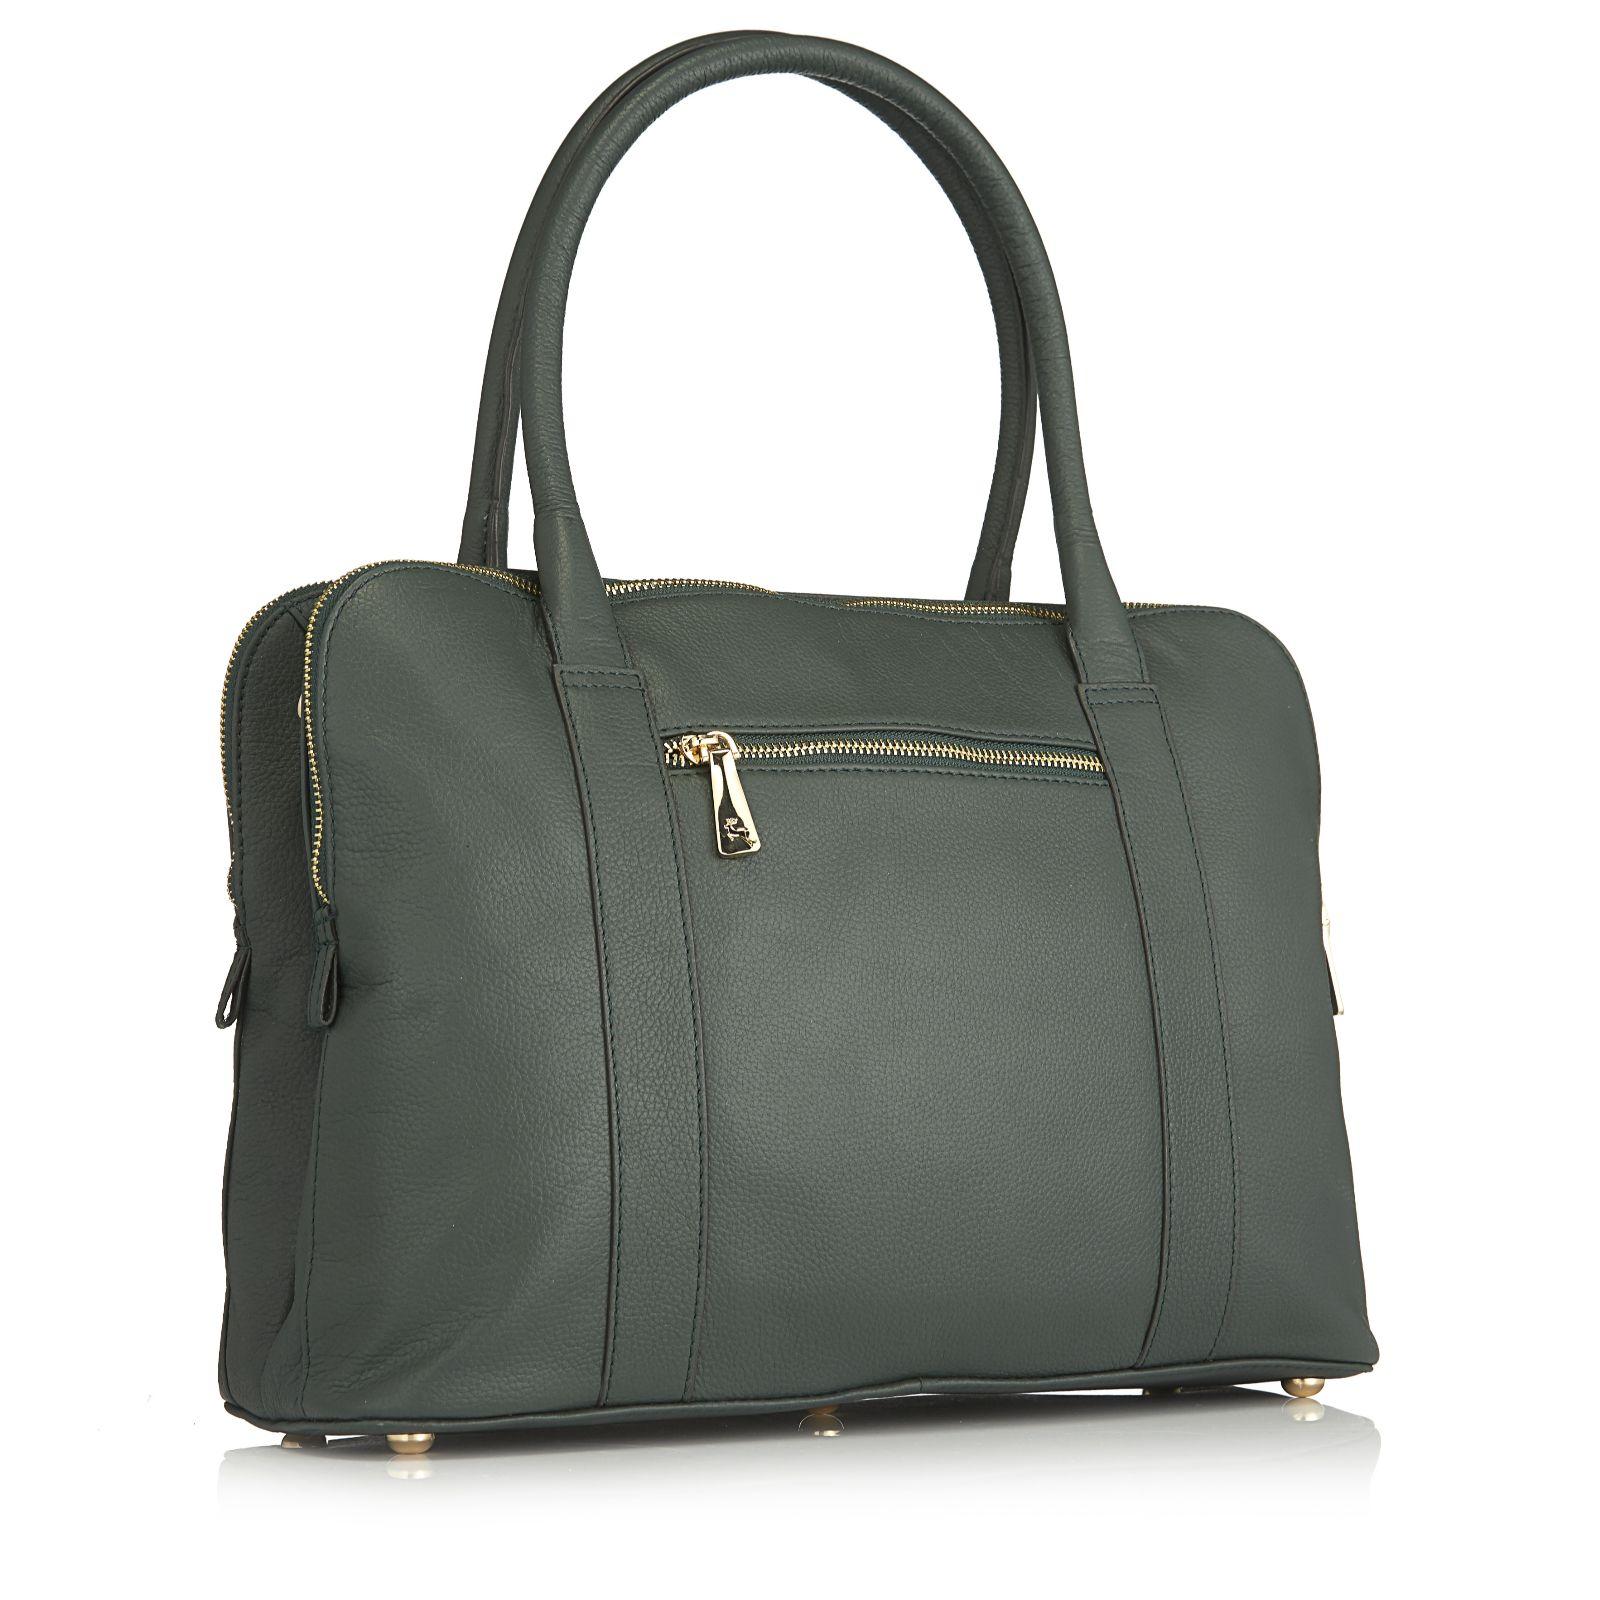 3f9fcc1cdbe Ashwood Leather Triple Compartment Shoulder Bag - QVC UK